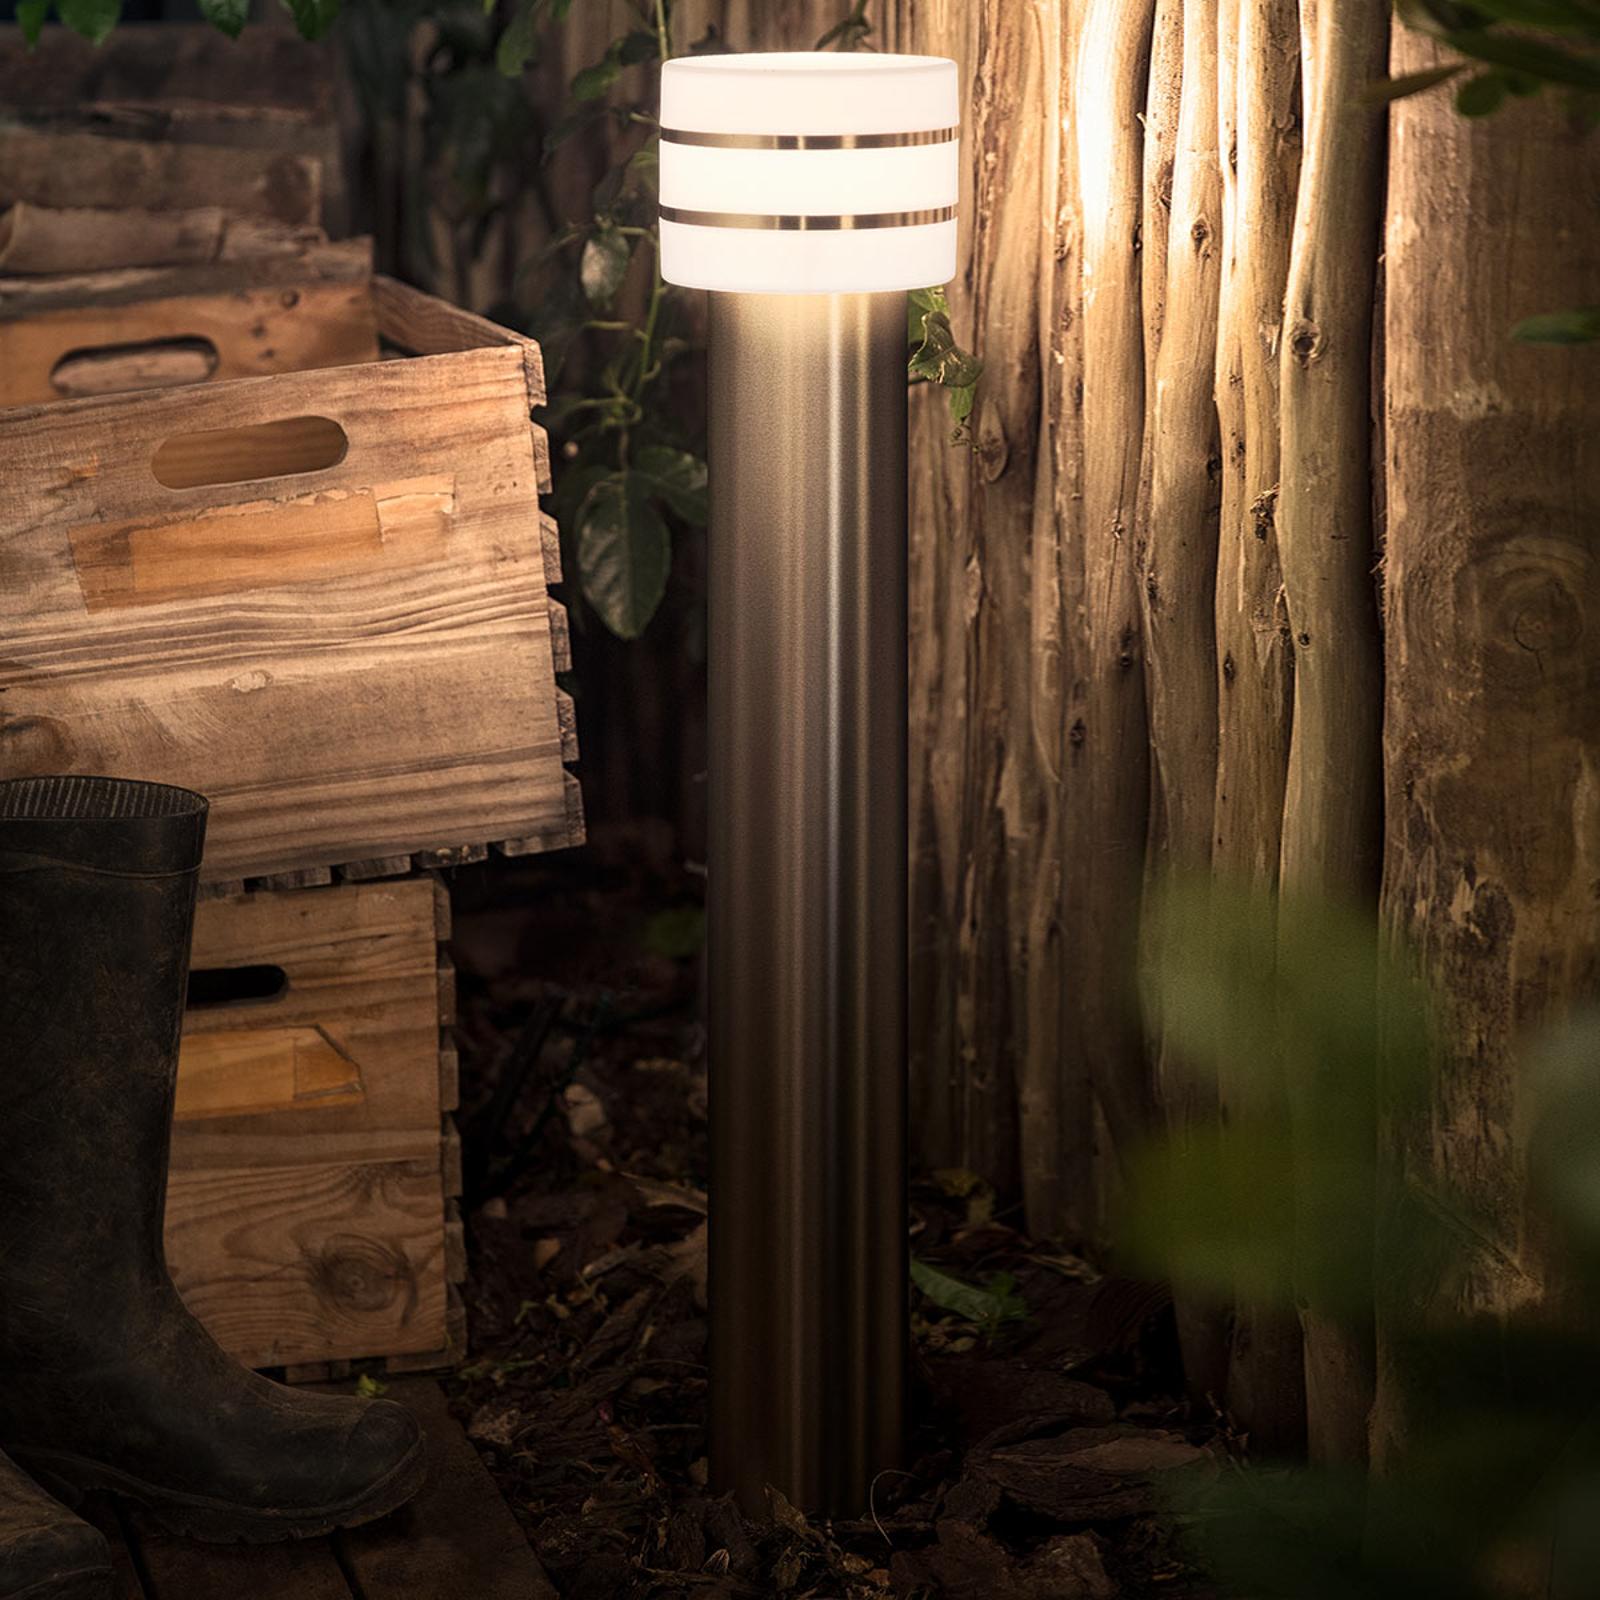 Philips Hue słupek ogrodowy LED Tuar